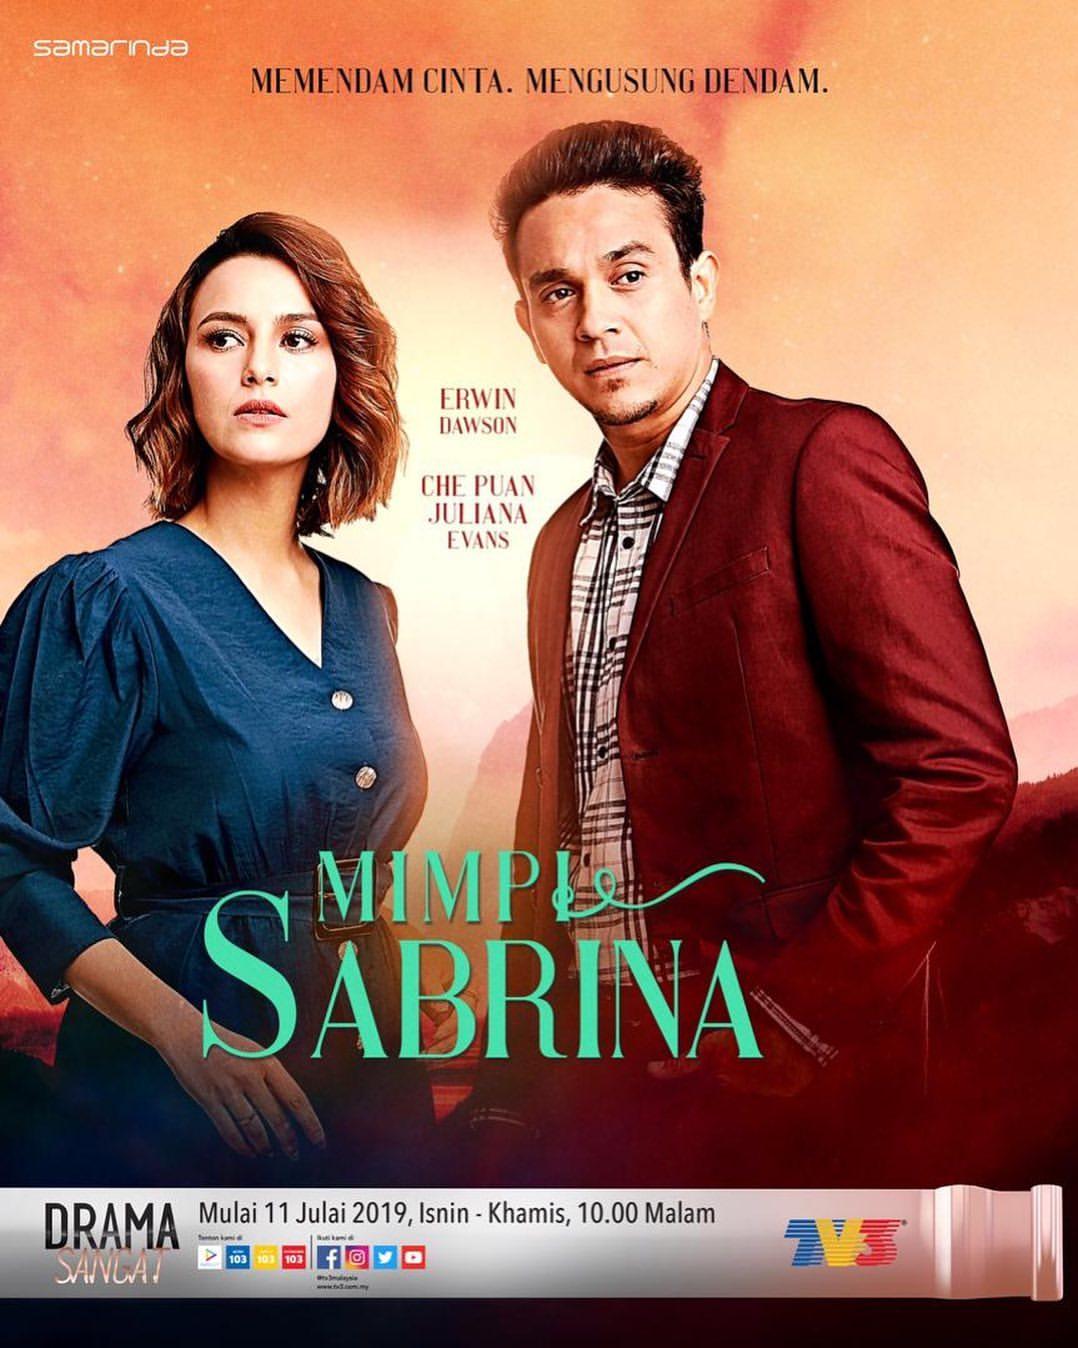 Mimpi Sabrina